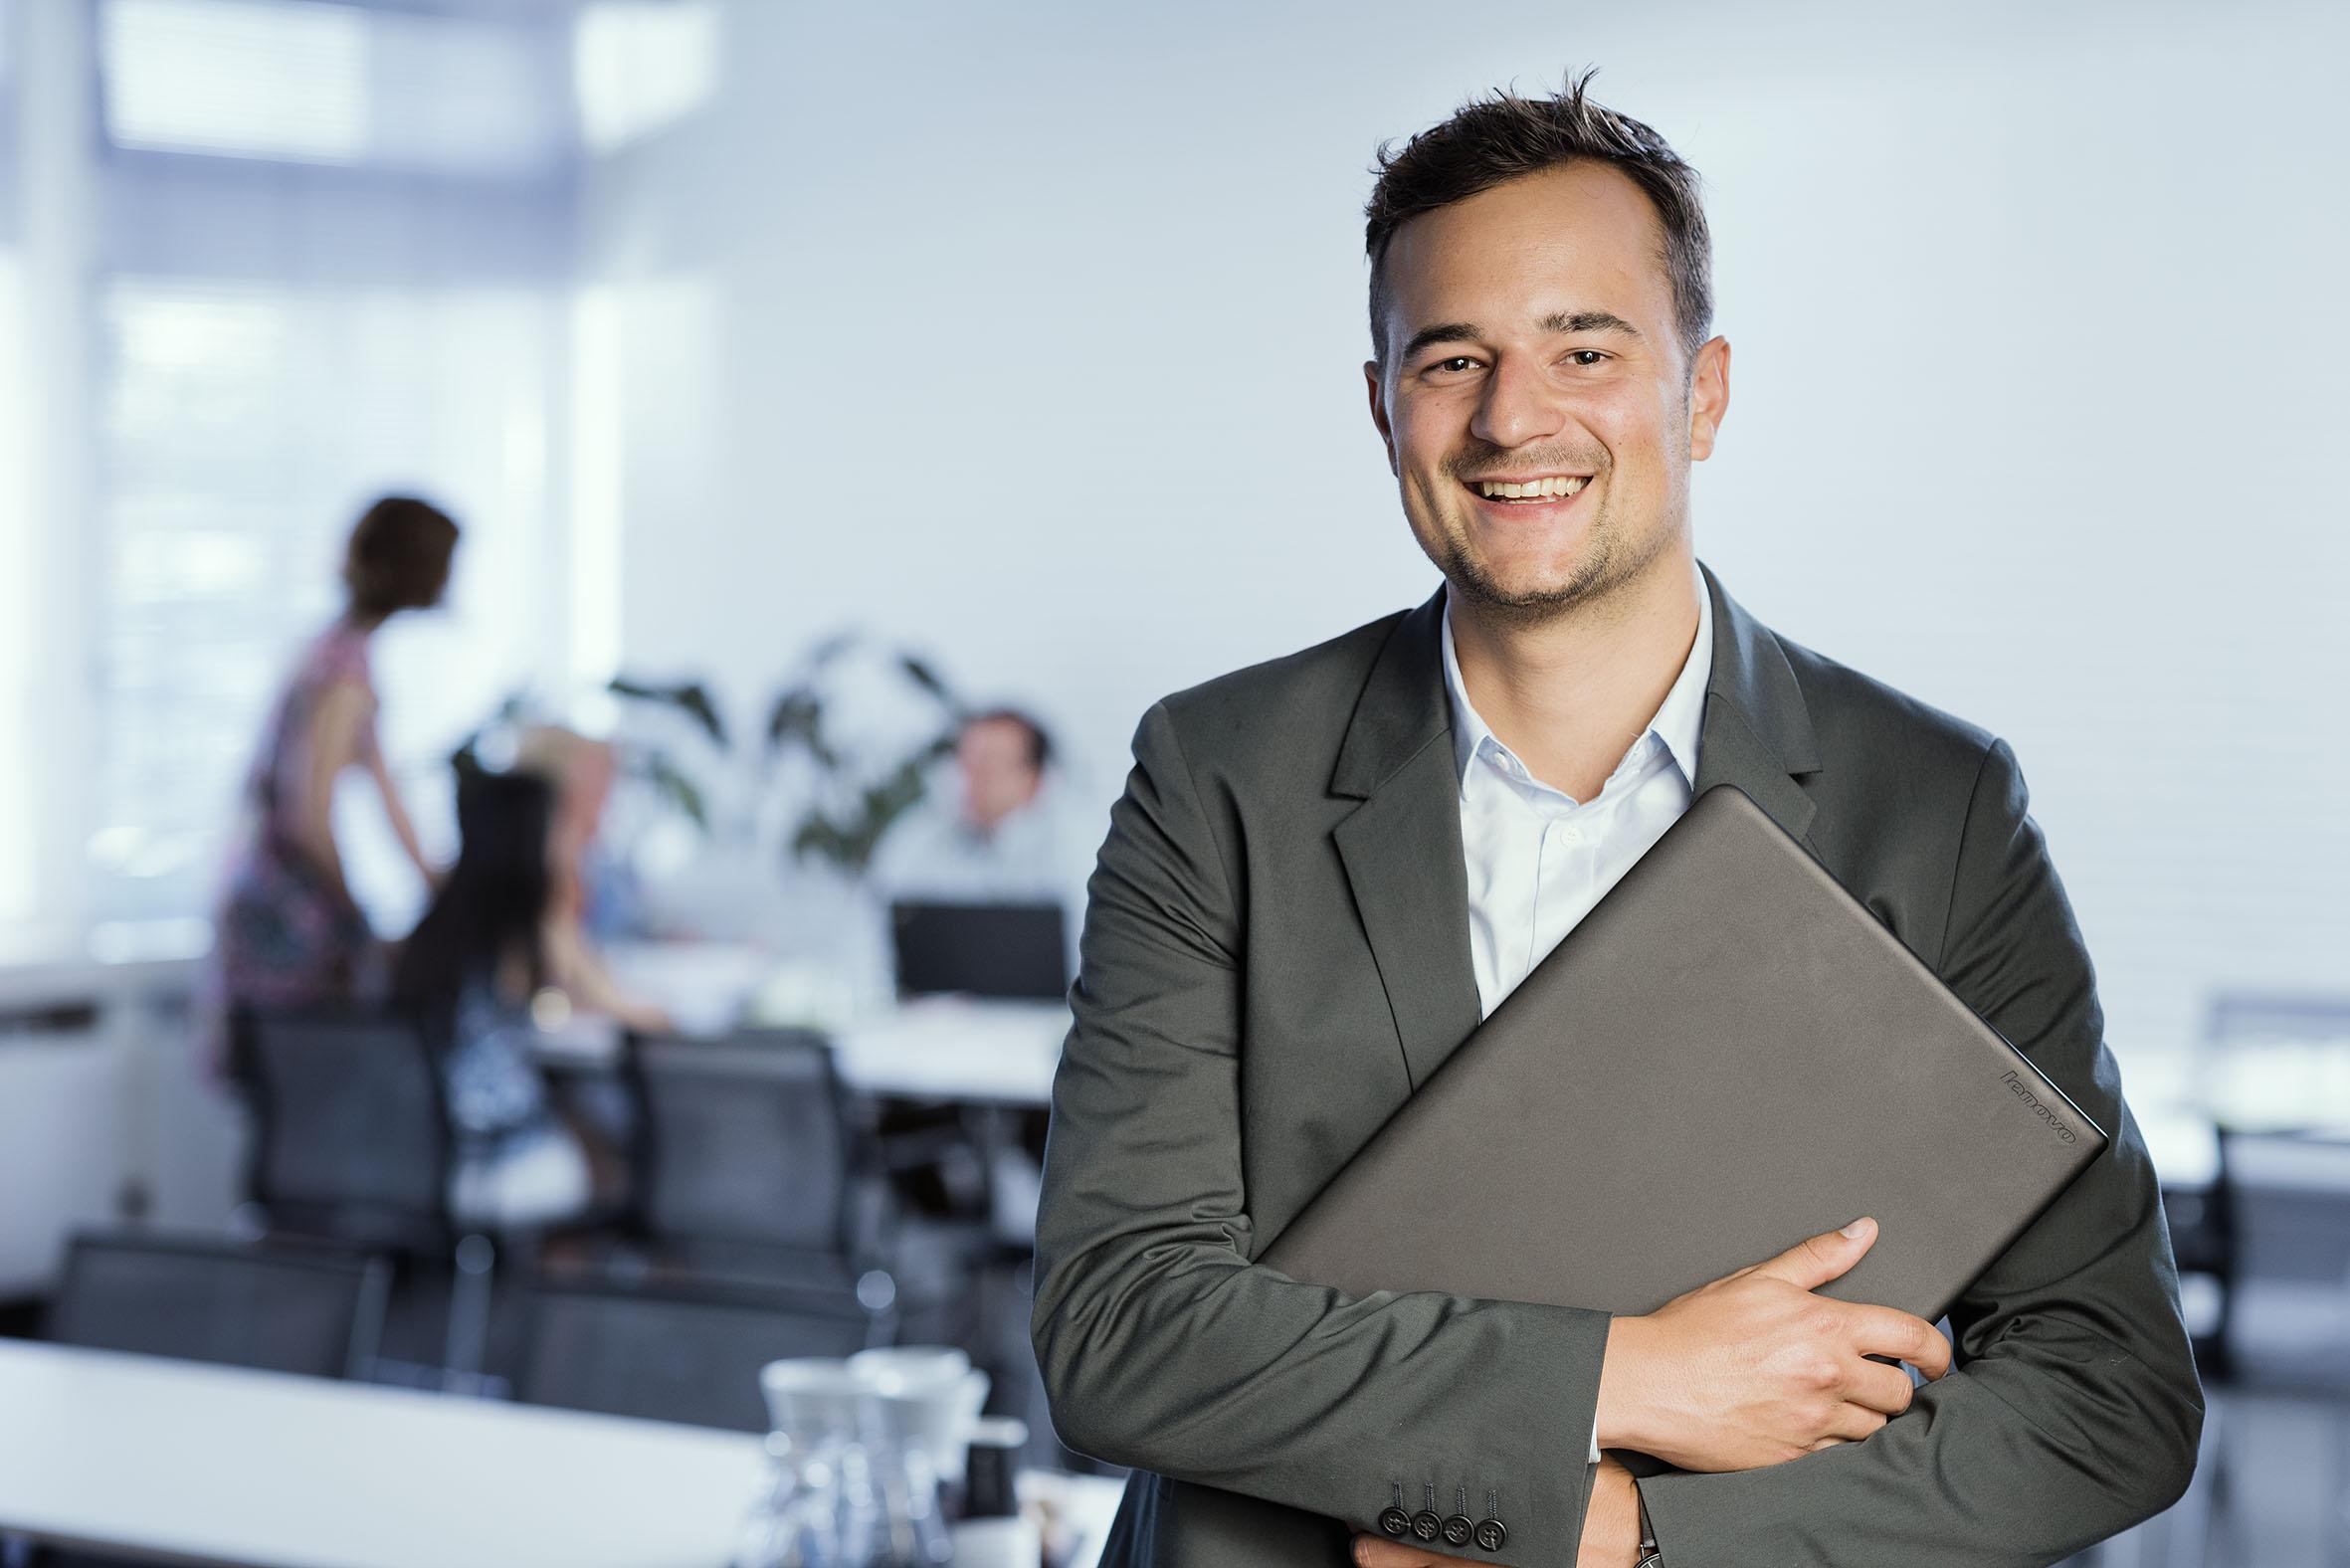 Arthur Los Fotografie - HR en rekrutering